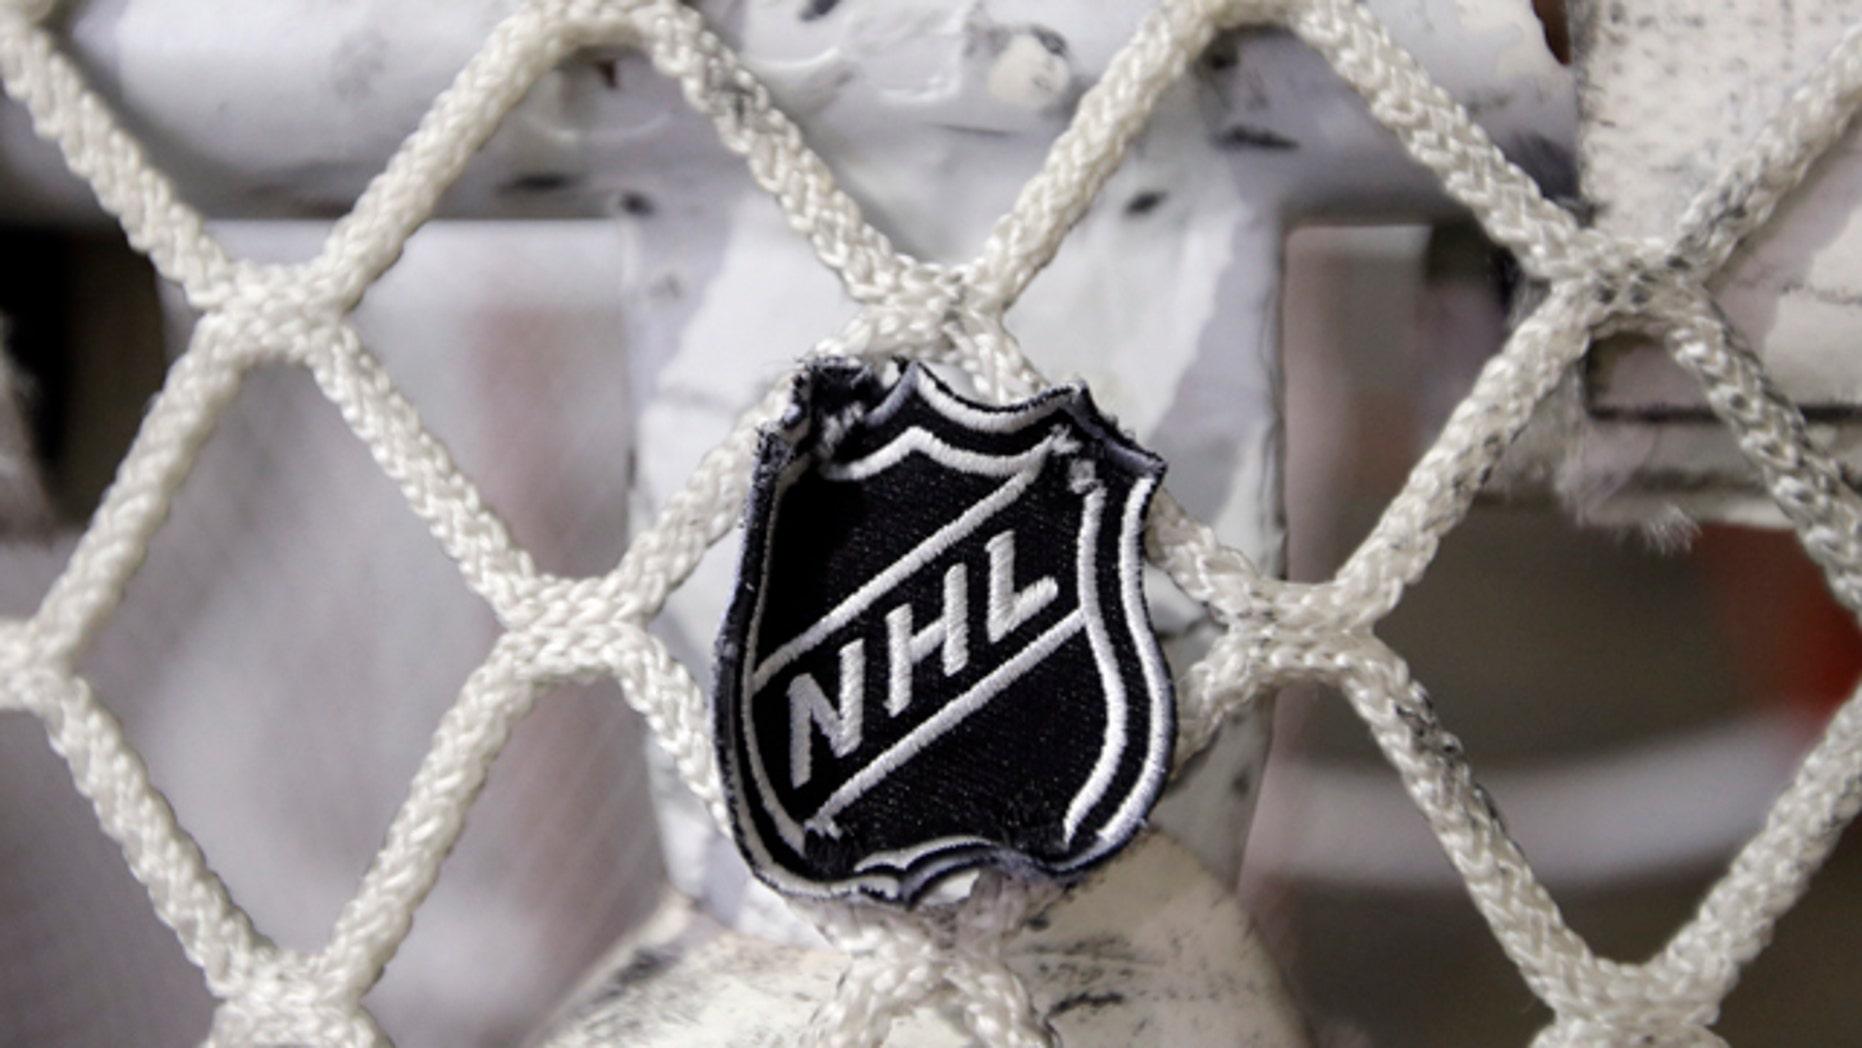 Sept. 17, 2012: The NHL logo is seen on a goal at a Nashville Predators practice rink in Nashville, Tenn. (AP)